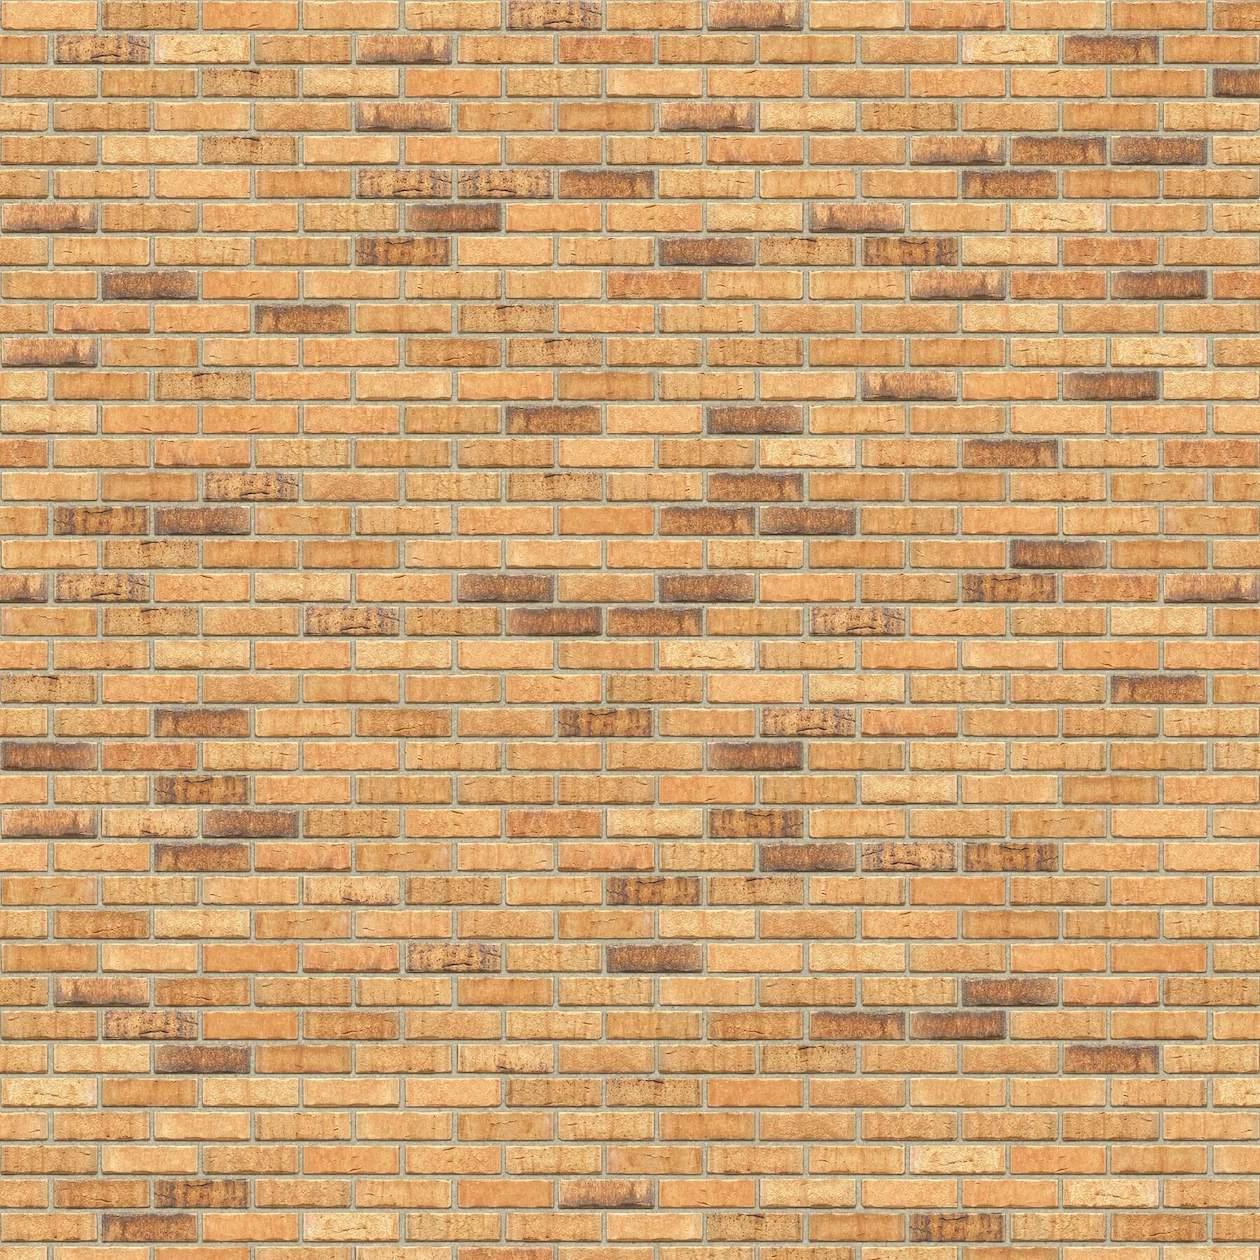 Puna-cigla-FeldHaus-Klinker-brick-house-nf-k-665-Bez Fuga